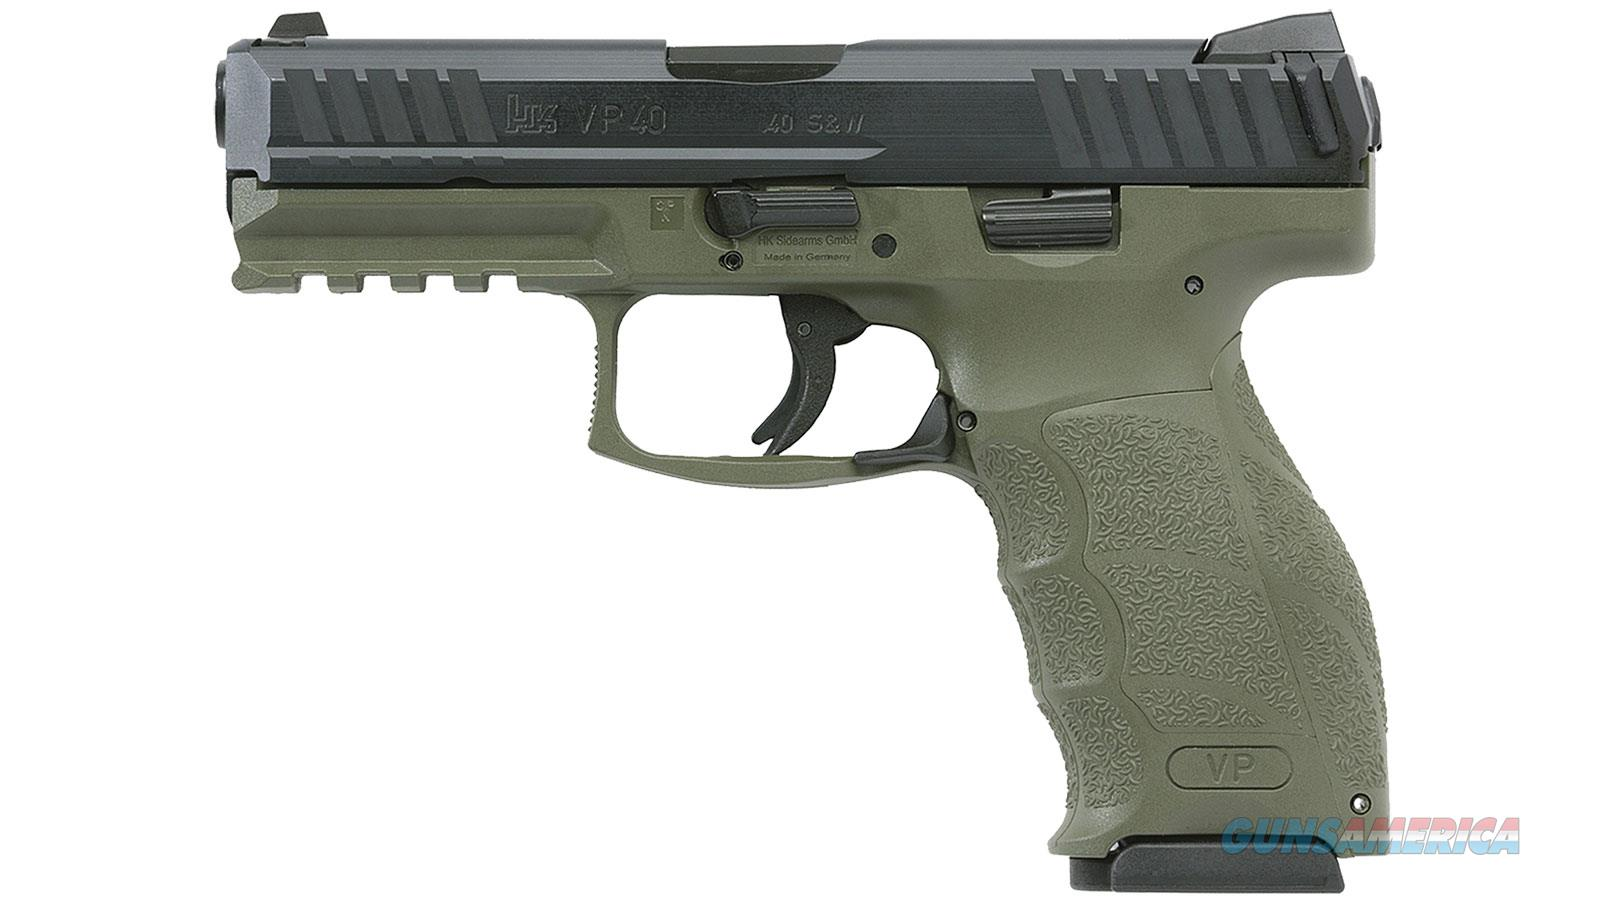 "Heckler & Koch Vp40 40Sw 4.1"" 13Rd 700040GRLE-A5  Guns > Pistols > H Misc Pistols"